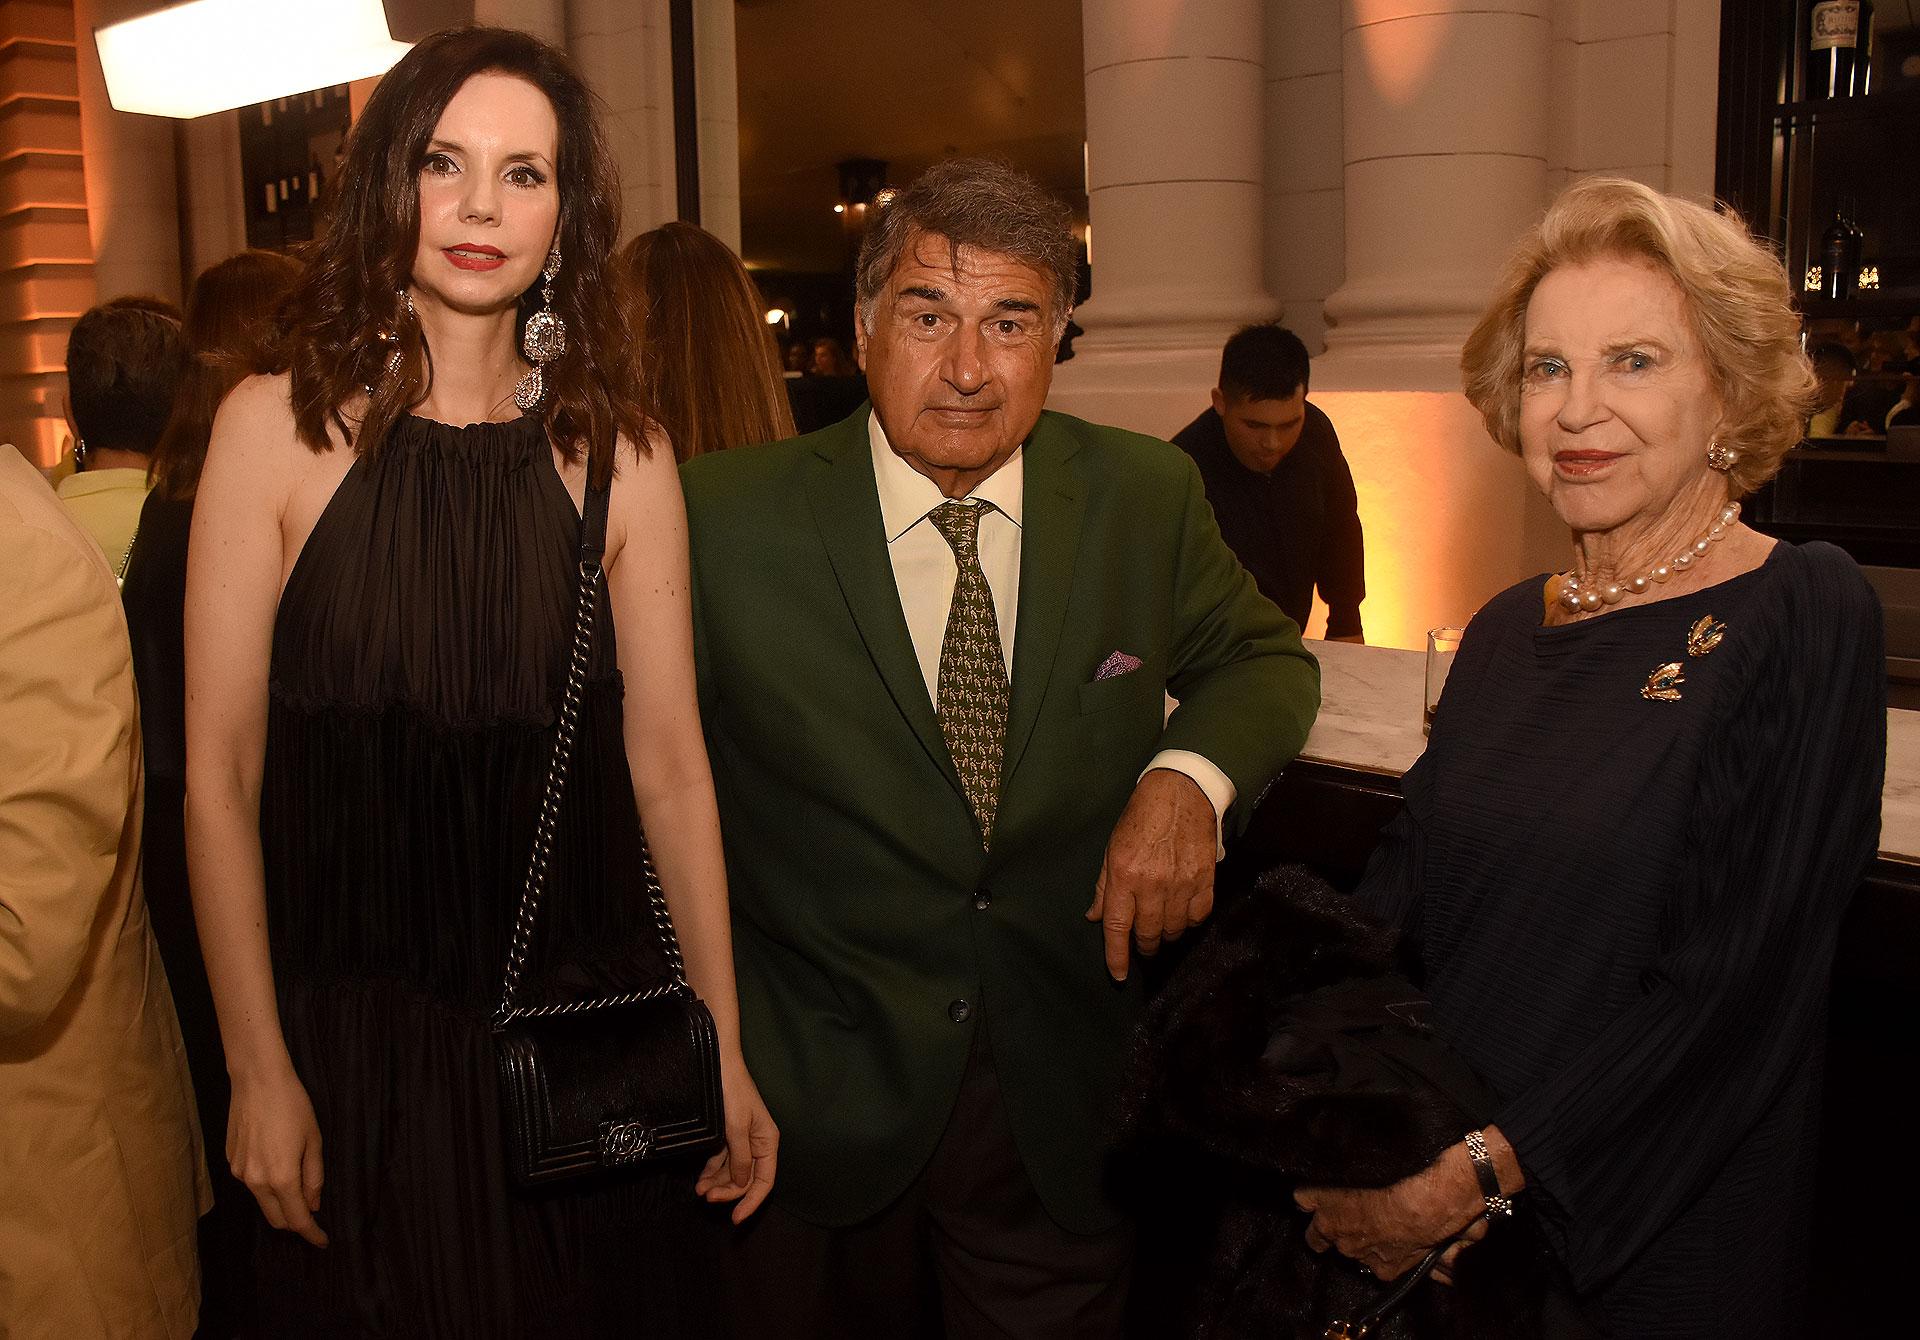 Marina Achaval, Jorge Vartparonian y Elizabeth Gurmendi